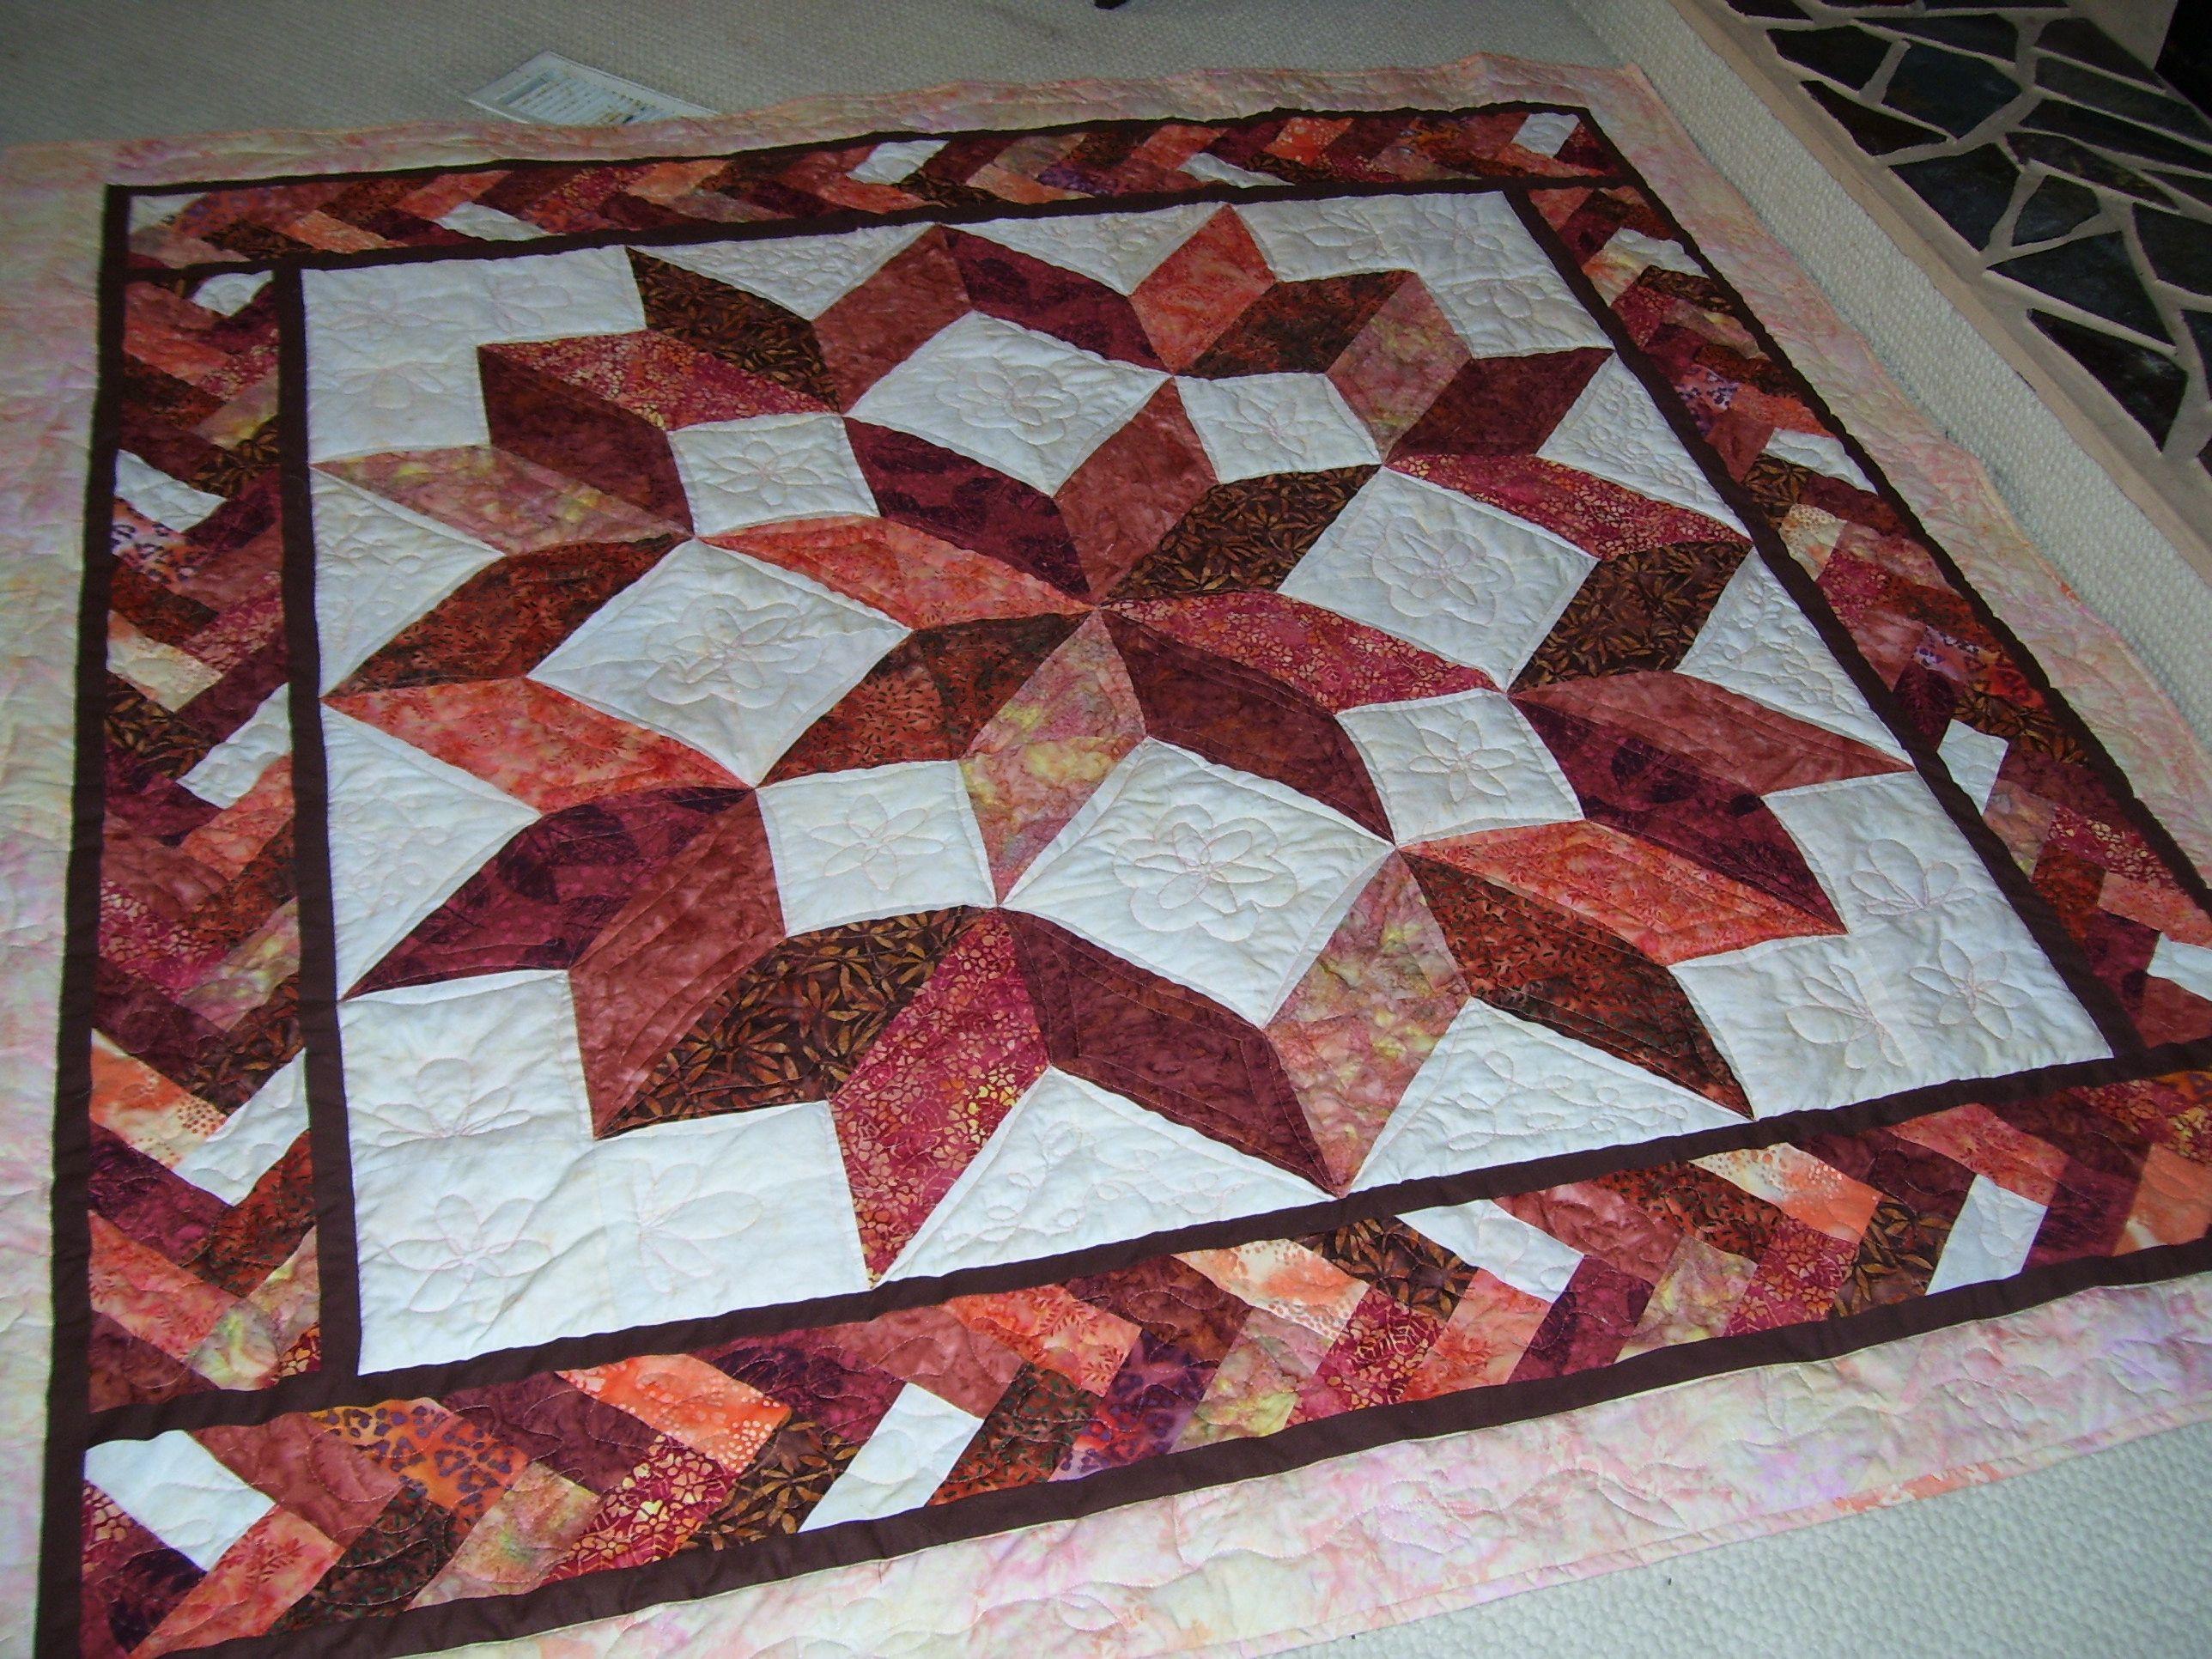 Carpenter's Star with braided borders | Quilting | Pinterest ... : pinterest quilt borders - Adamdwight.com